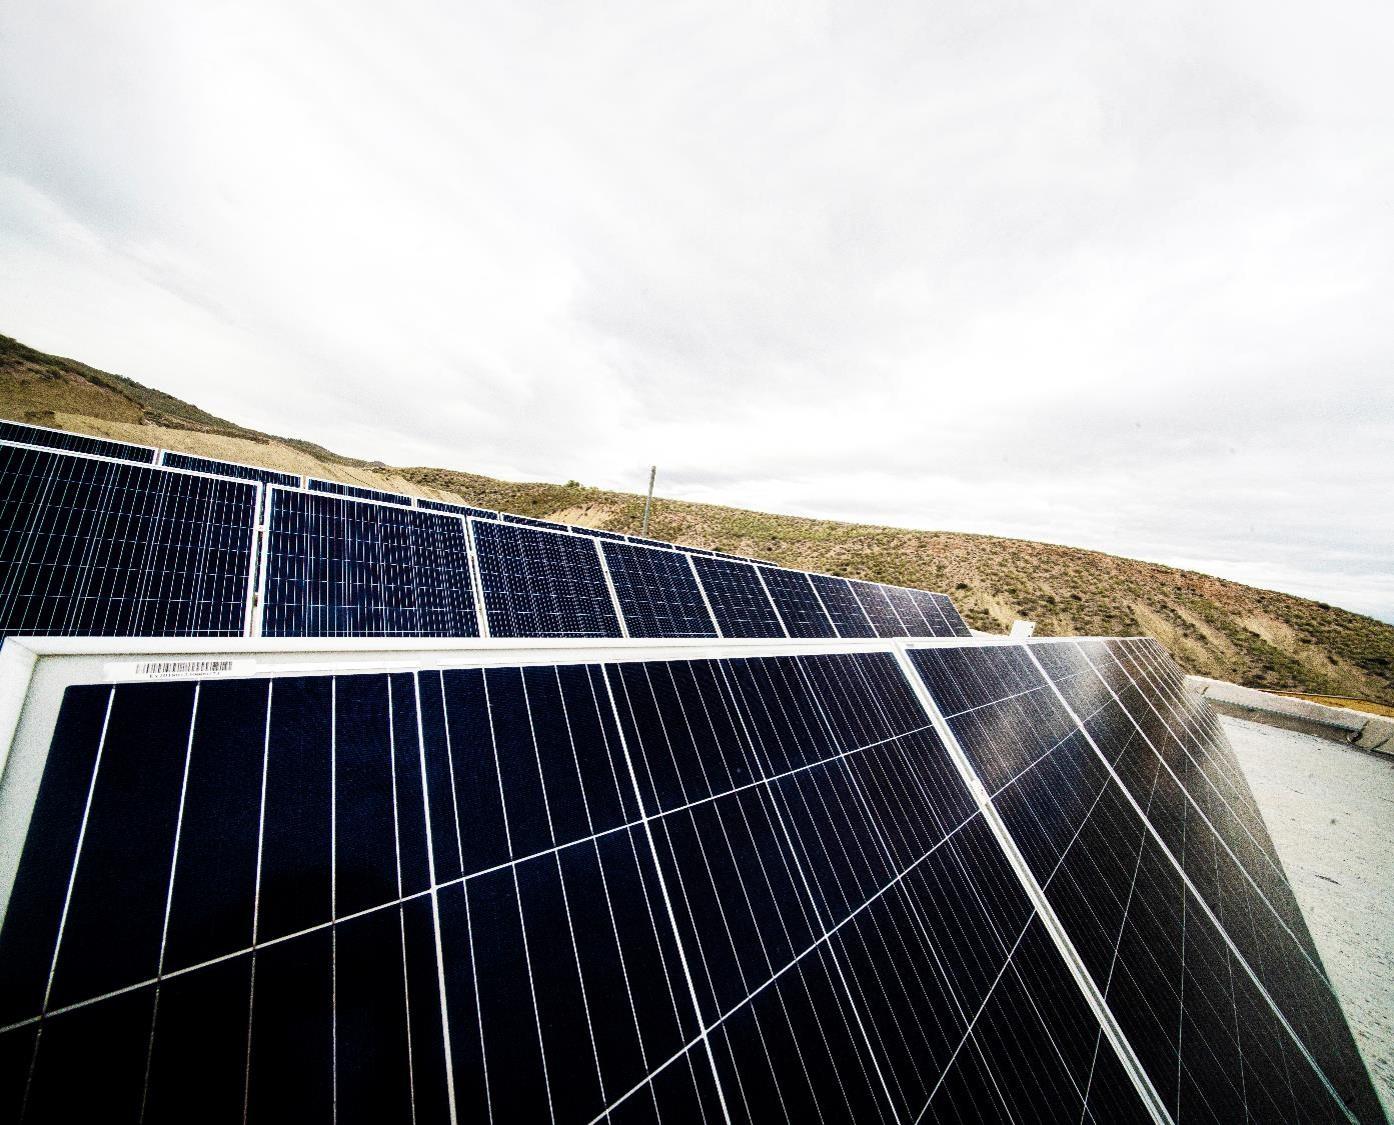 Image of placas solares in Hybriq - Cosentino